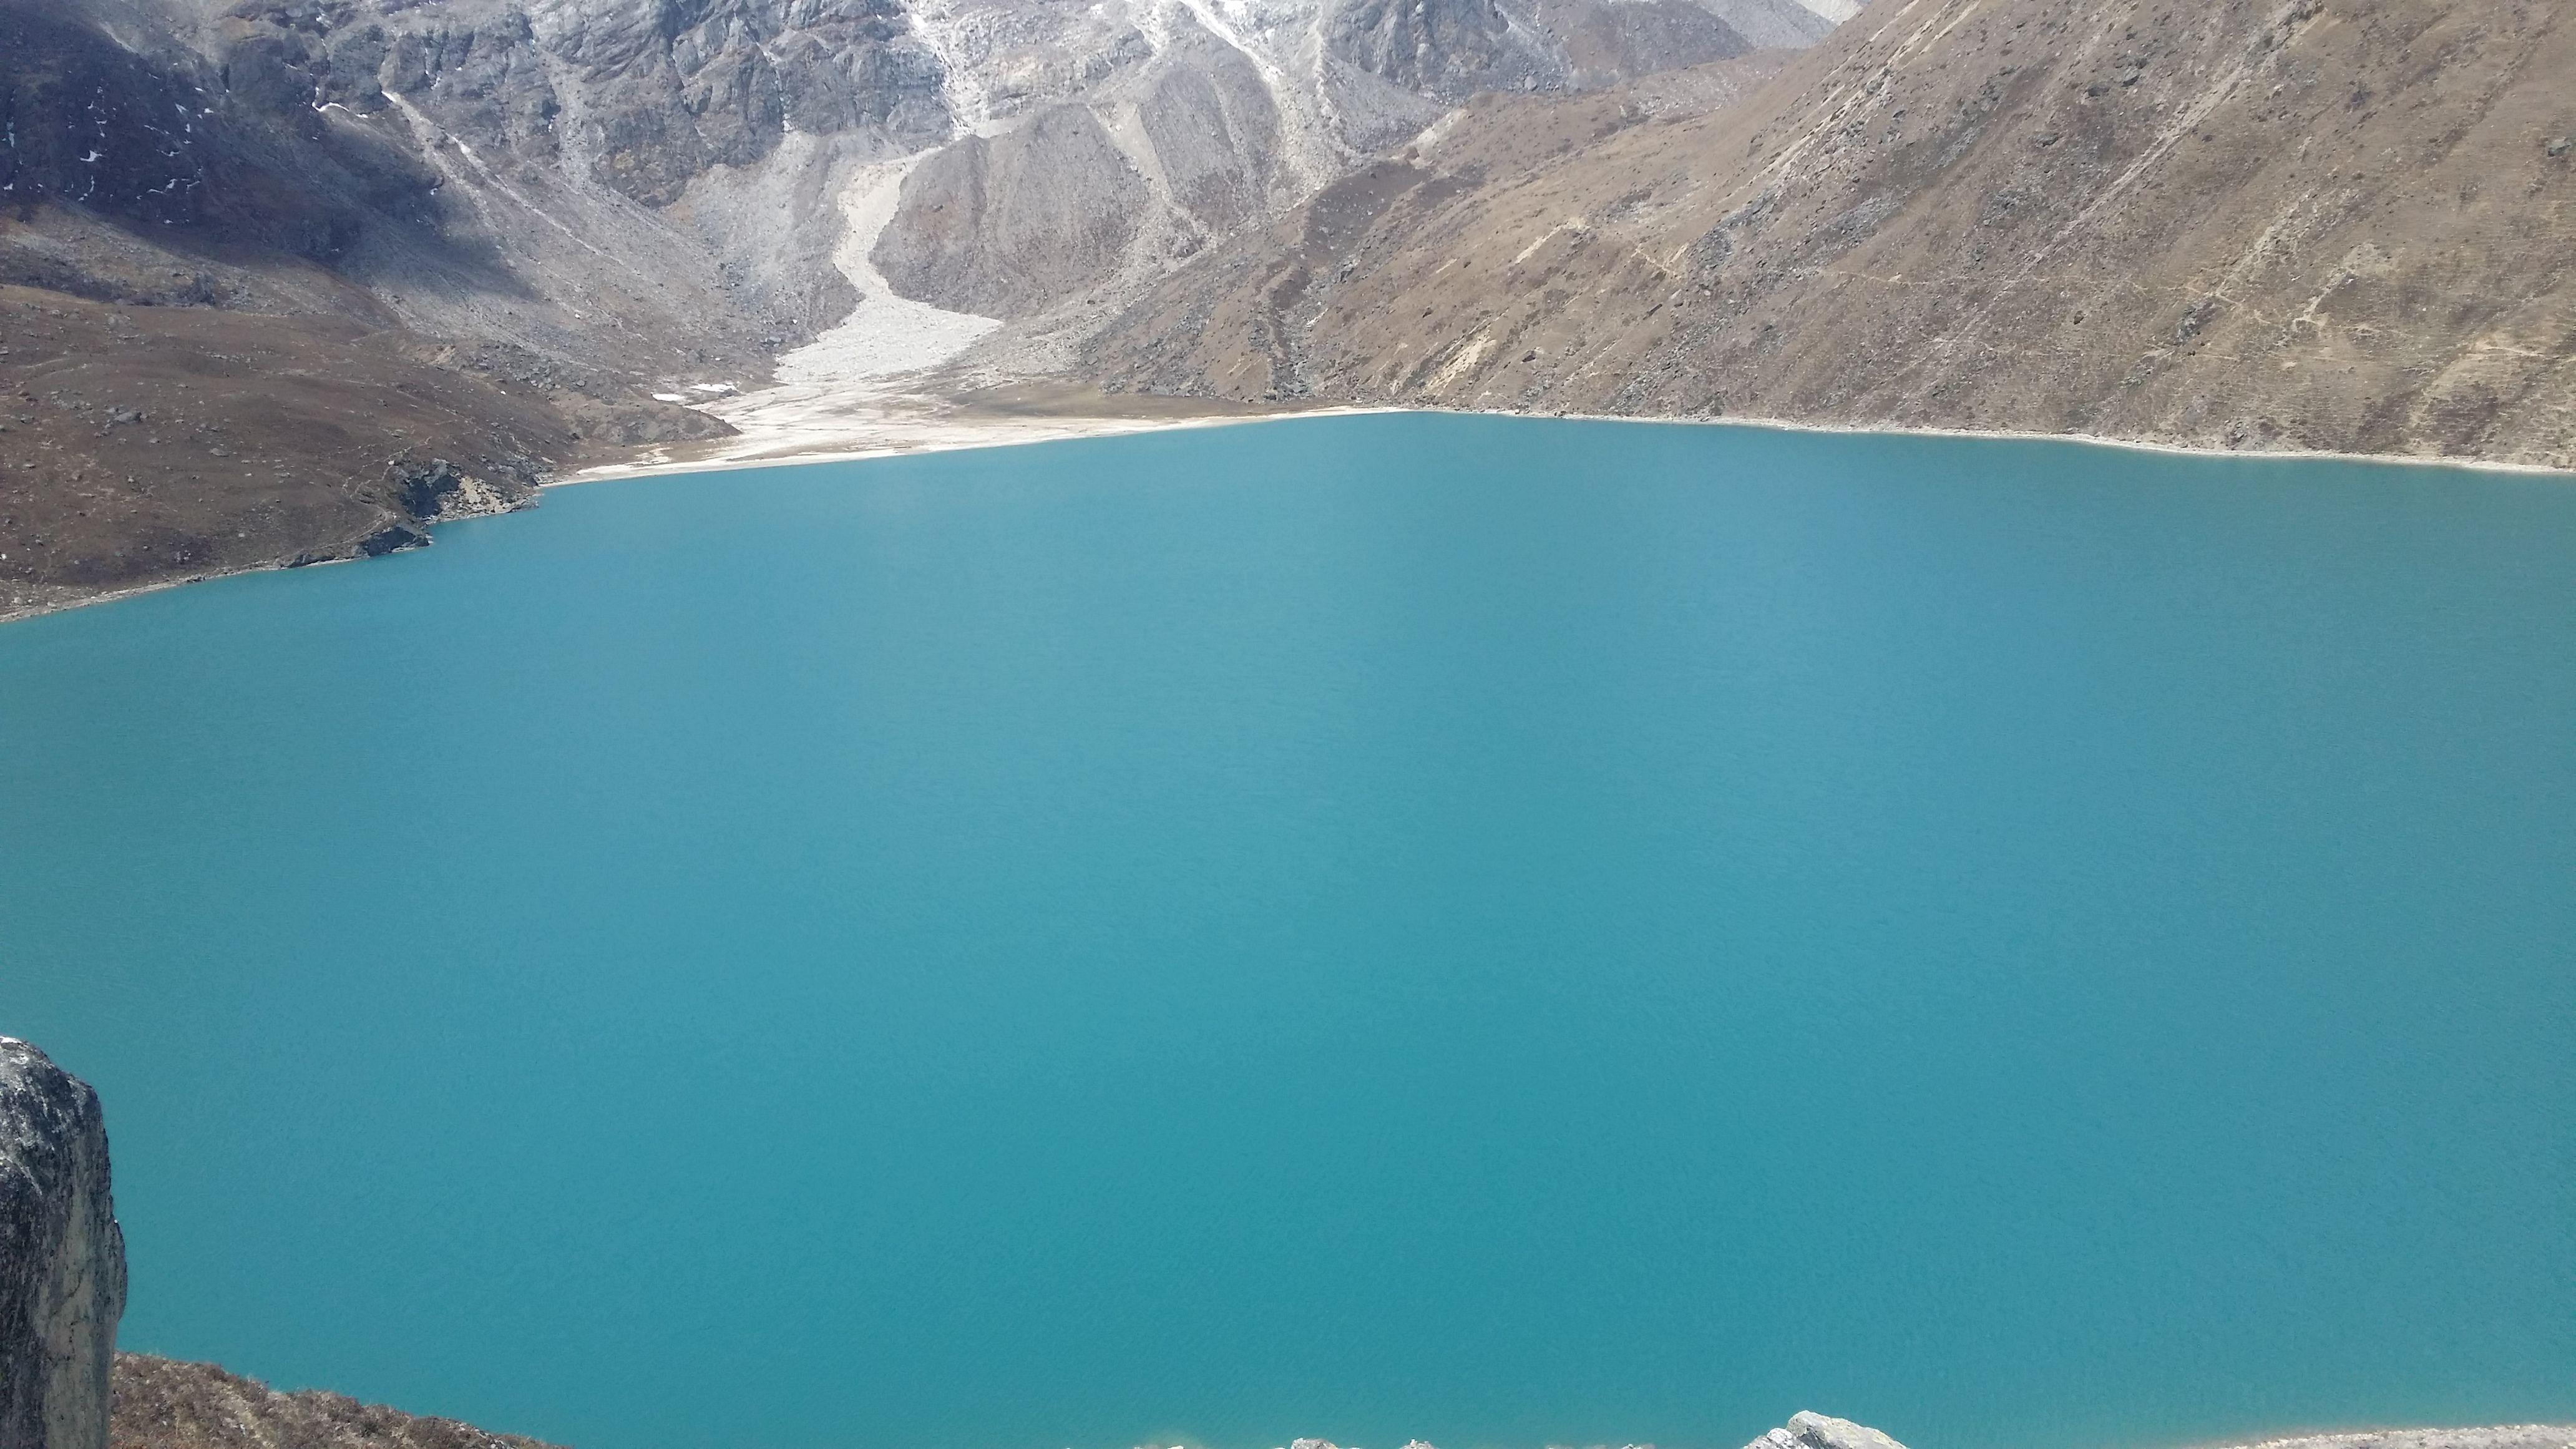 https://www.lifehimalayatrekking.com/gokyo-valley-trekking.html